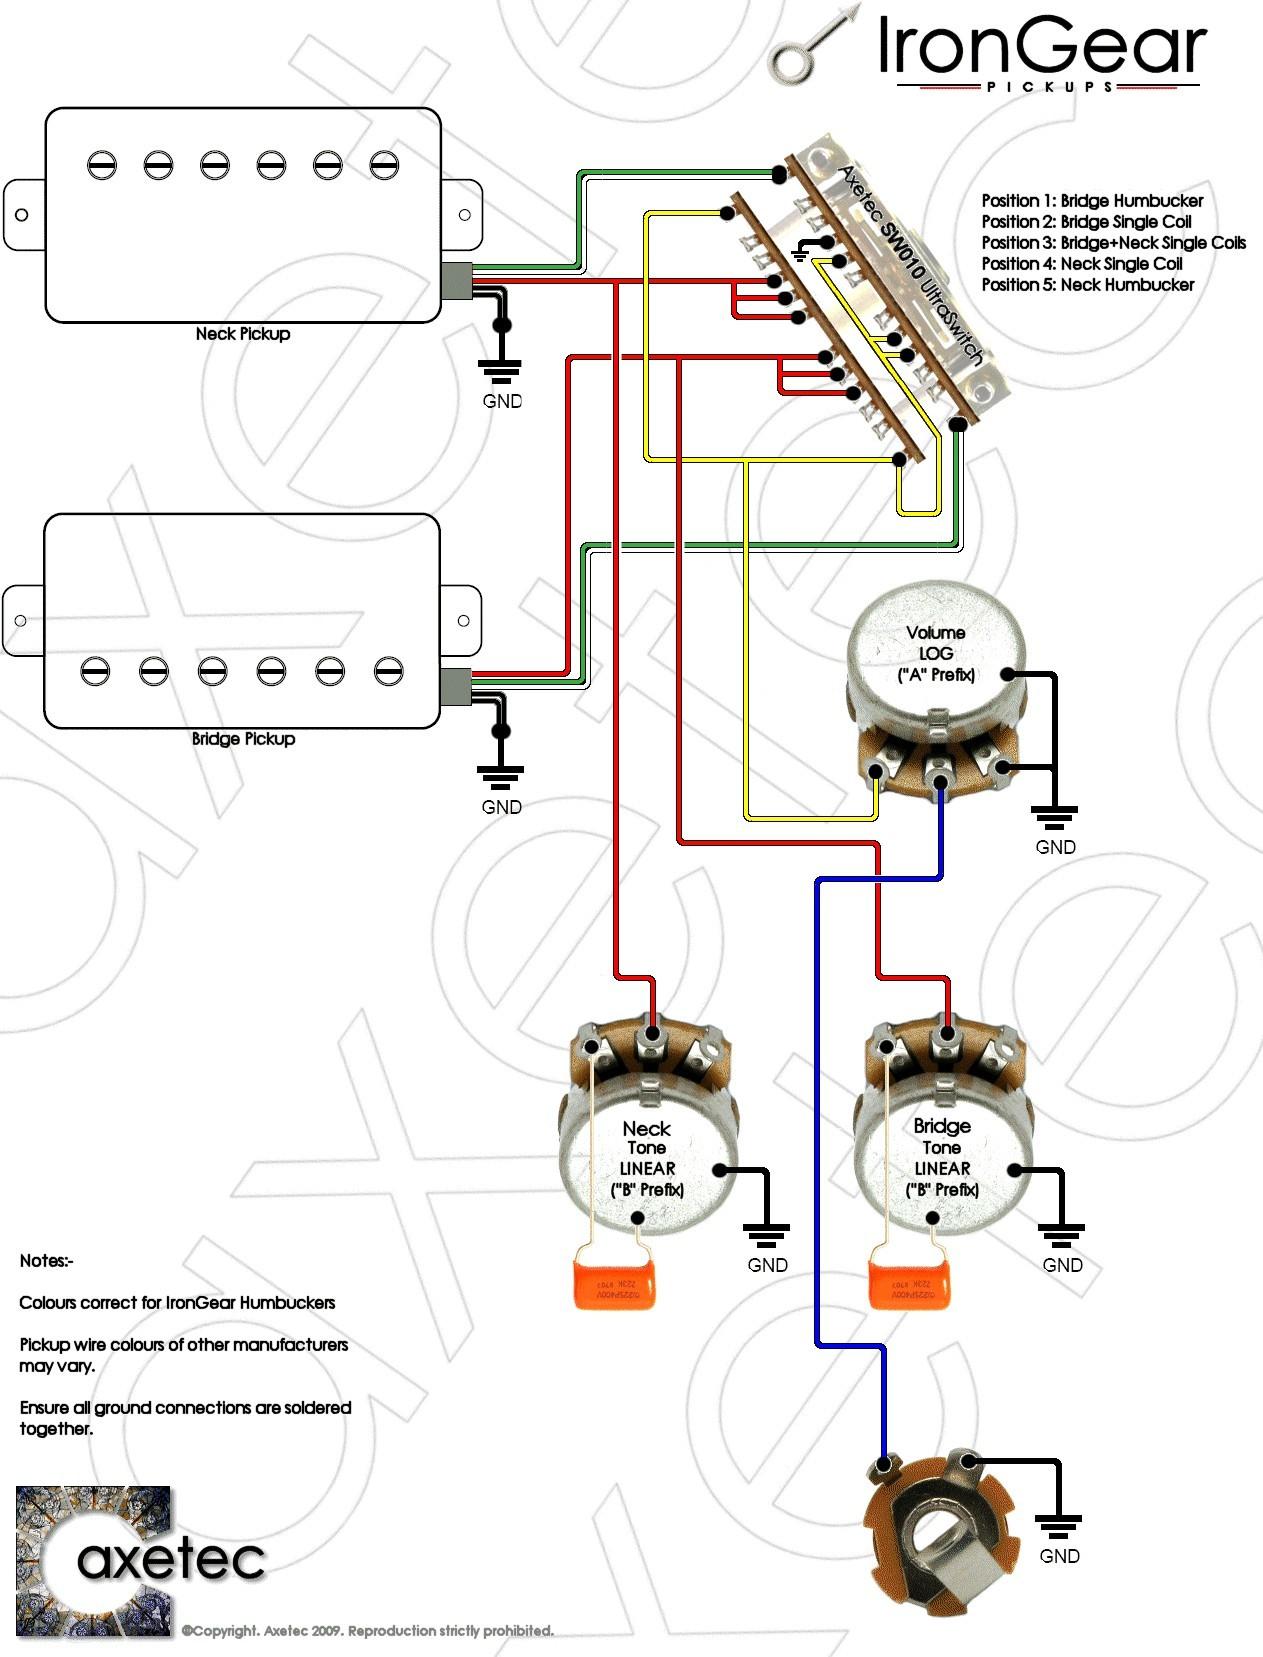 5 Way Switch Wiring Diagram New Diagram Fender 5 Way Switch Diagram Best solutions 5 Way